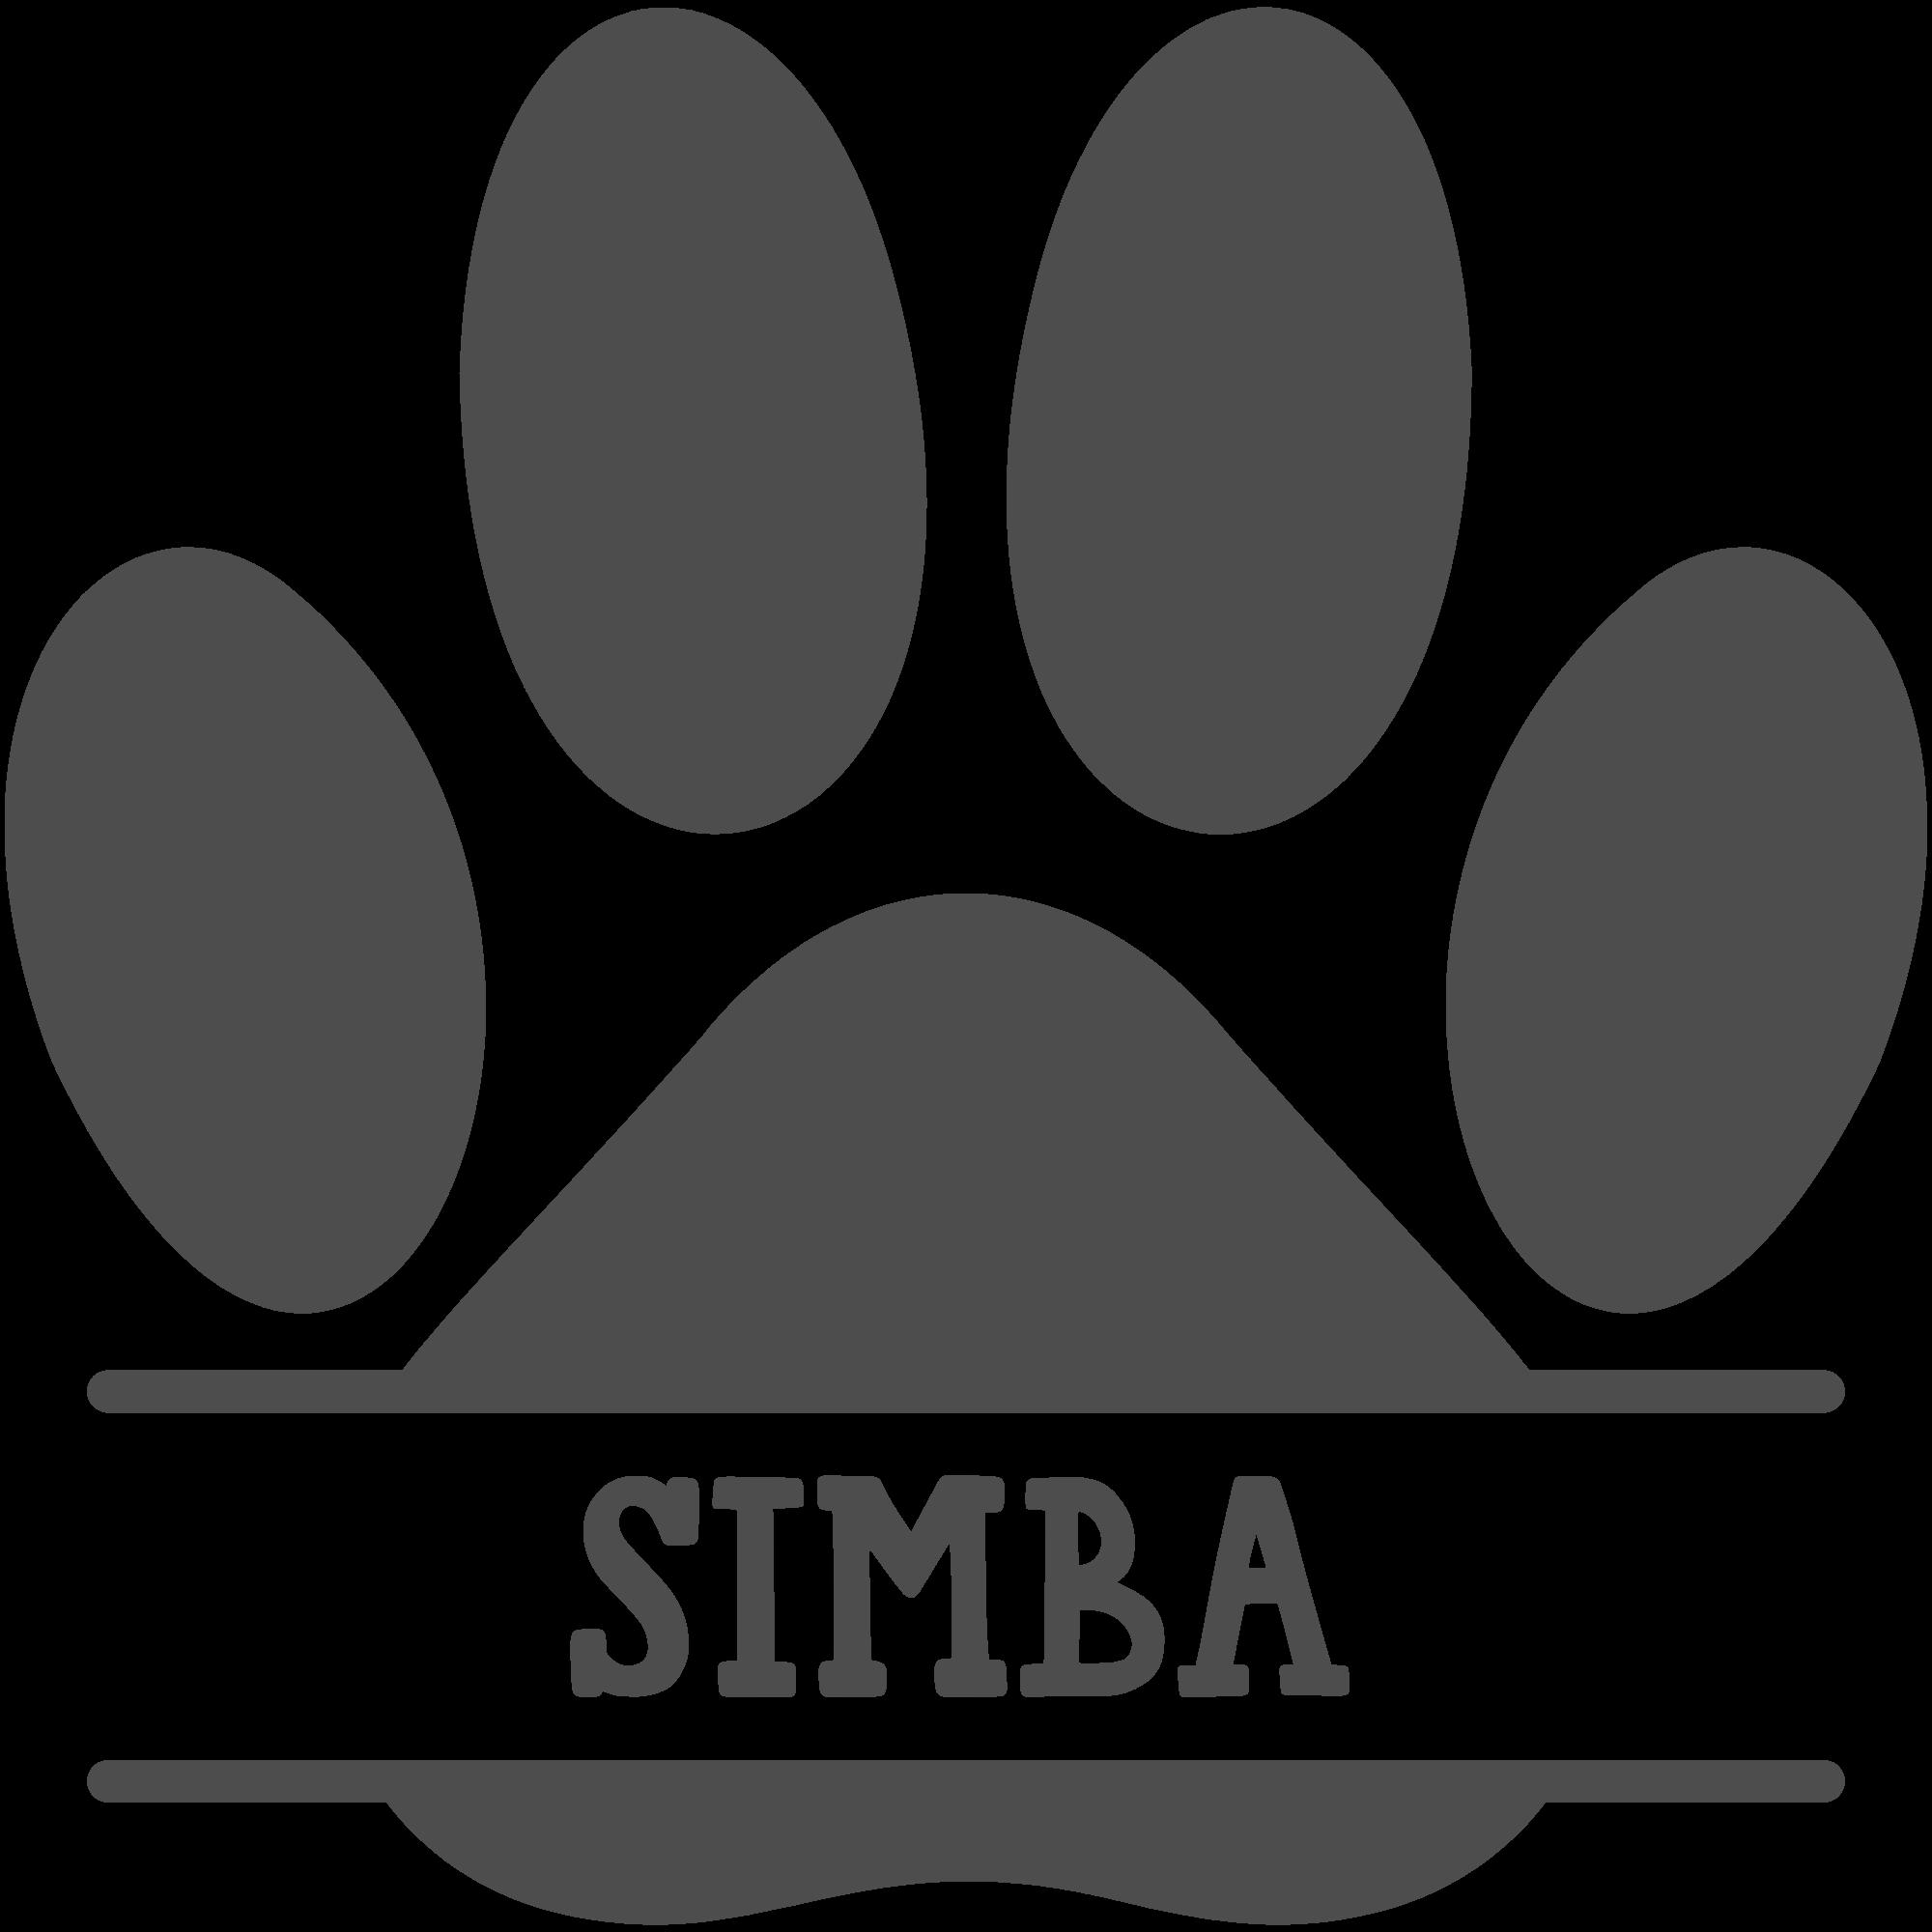 Free Svg Free Cat Paw Frame Svg Eps Dxf Files Free Monogram Free Svg Free Cats